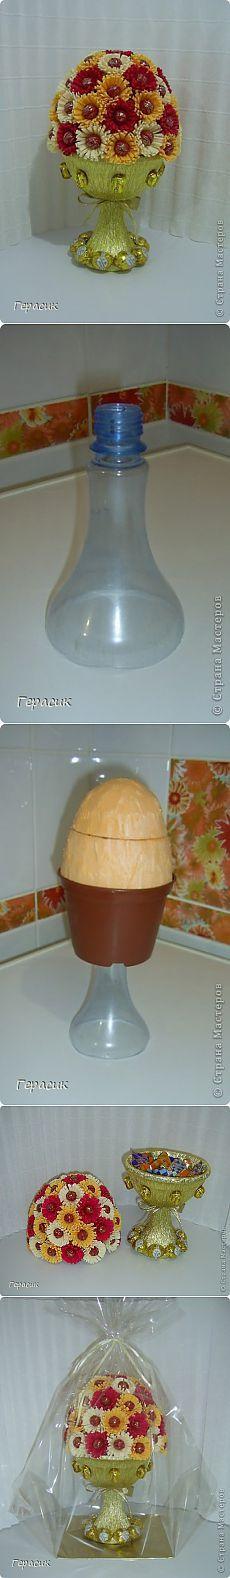 Яйцо-шкатулка МК | Страна Мастеров